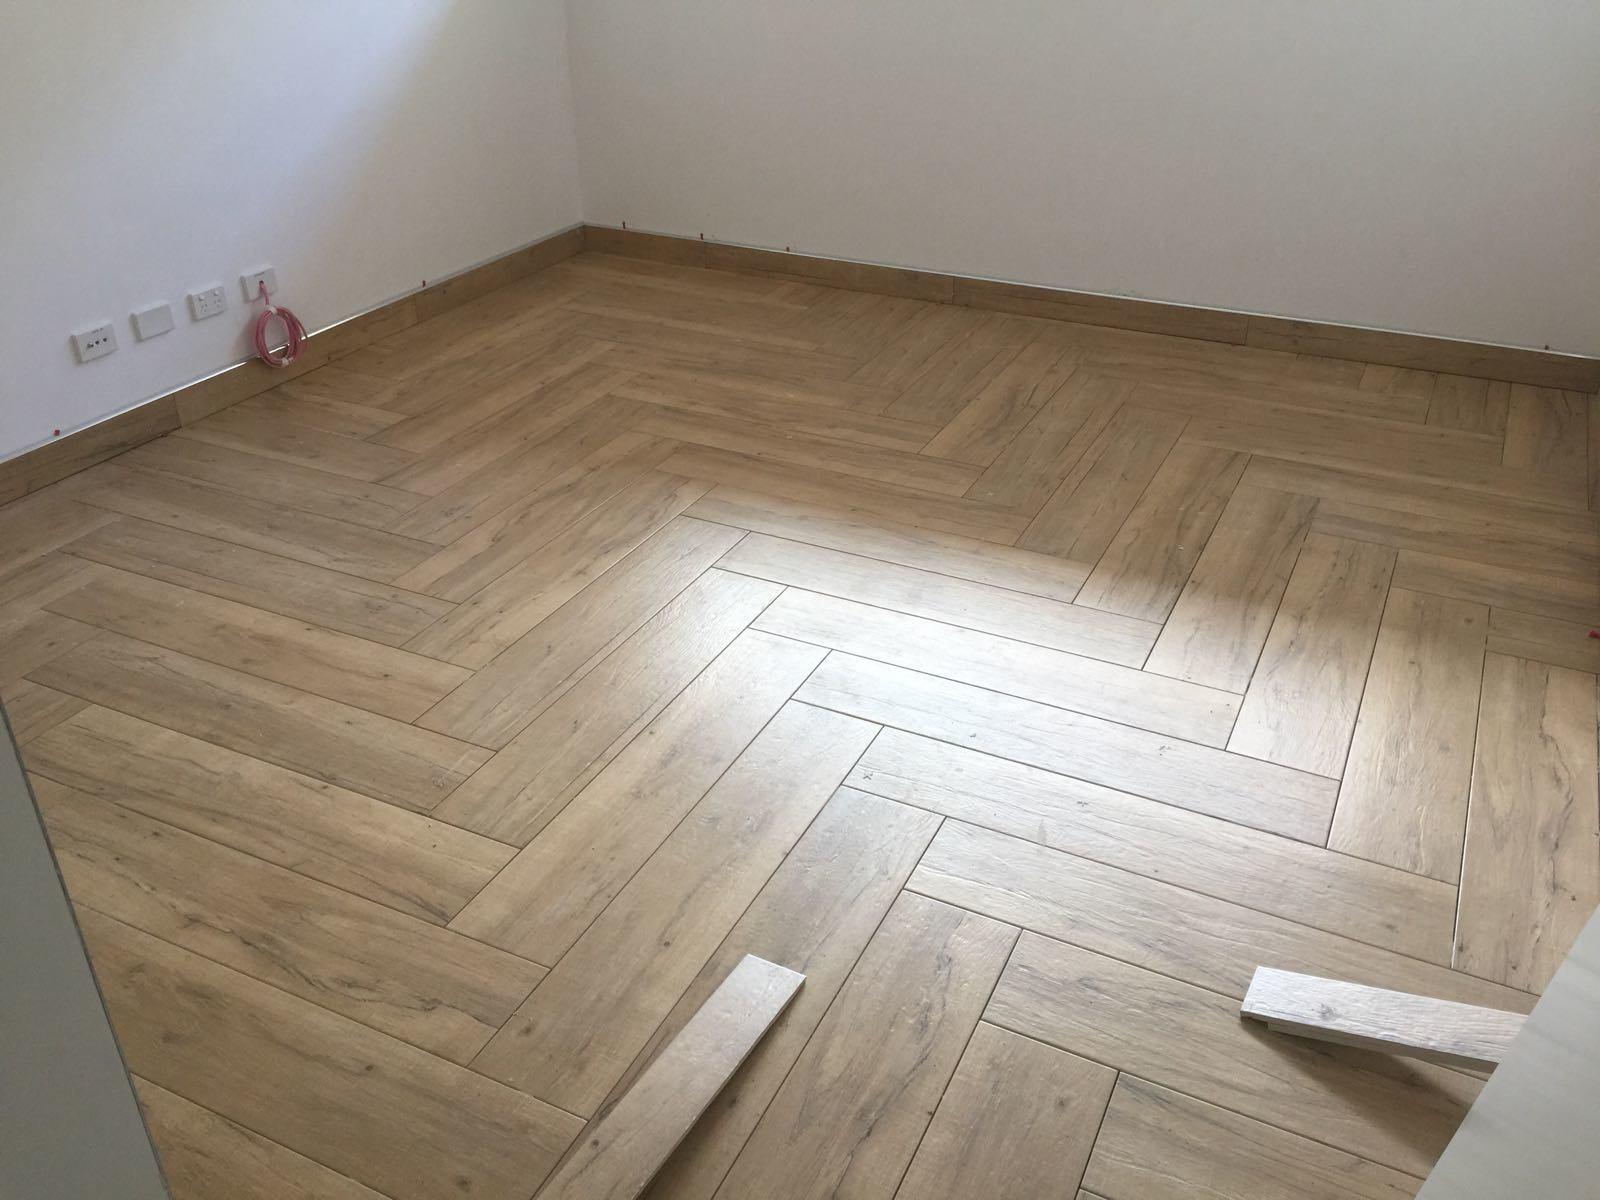 china 8x40 wood plank wall tiles